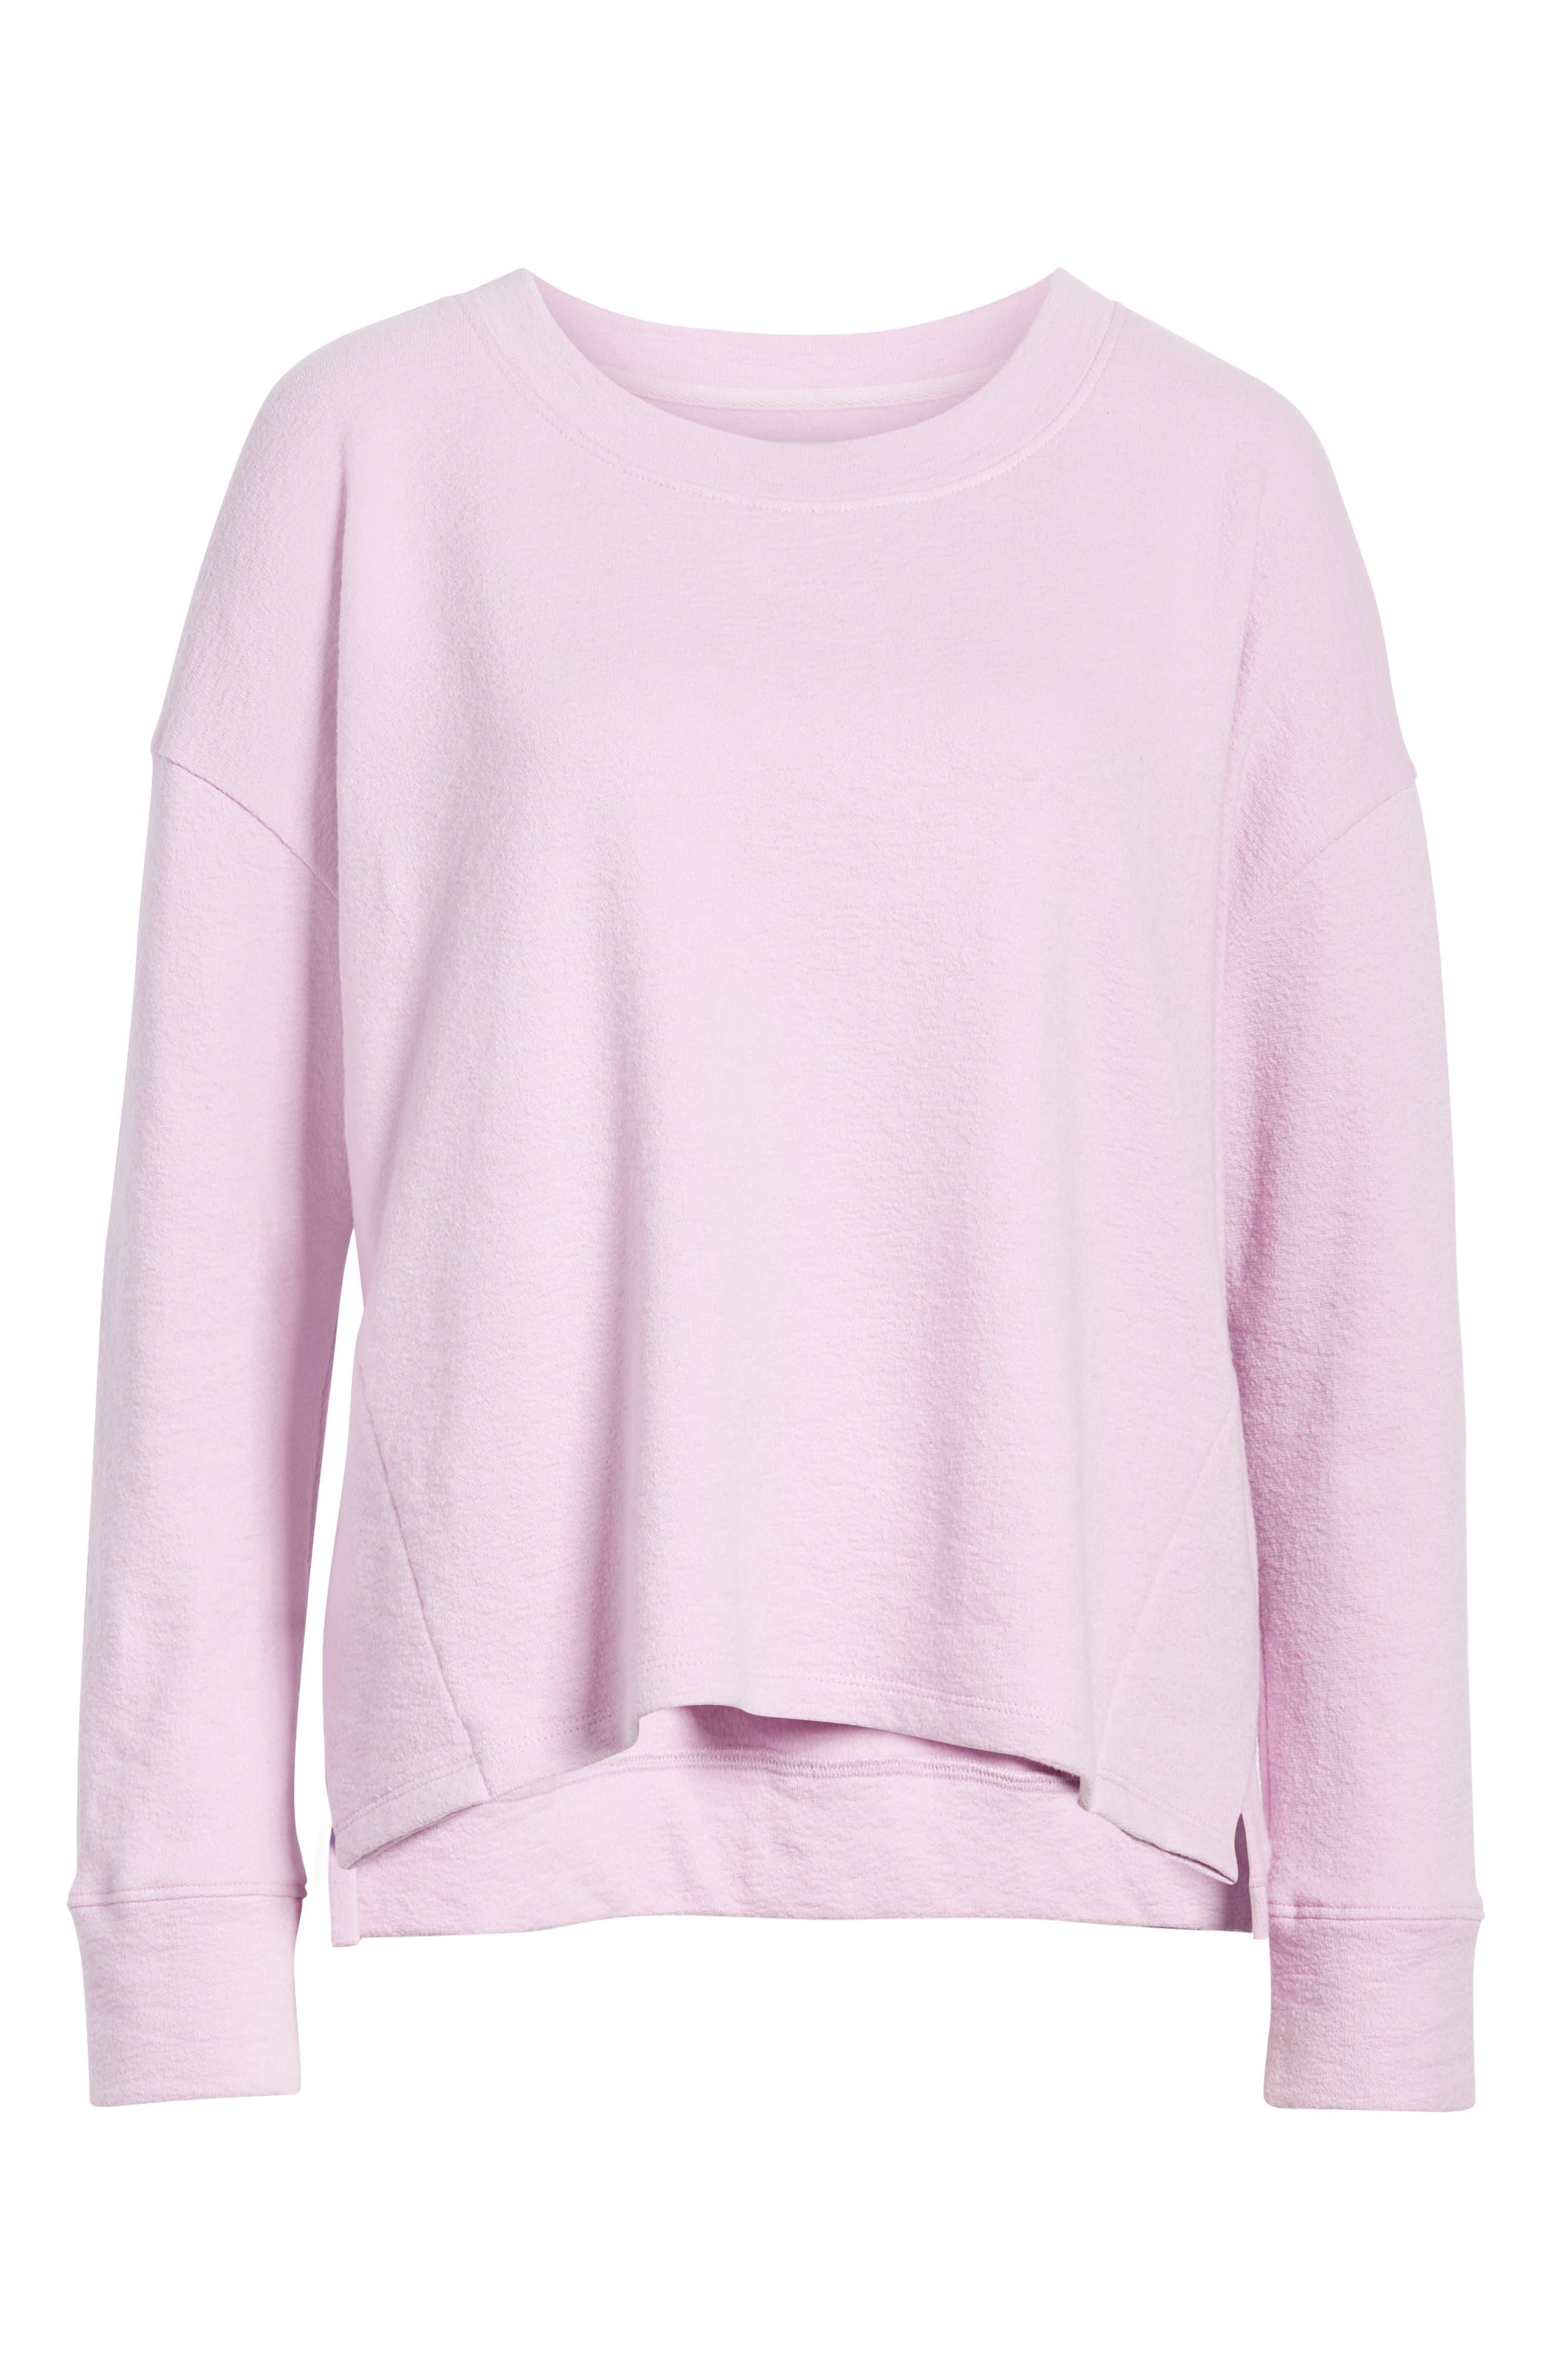 CASLON<SUP>®</SUP>, Side Slit Relaxed Sweatshirt, Alternate thumbnail 6, color, PINK BOUQUET